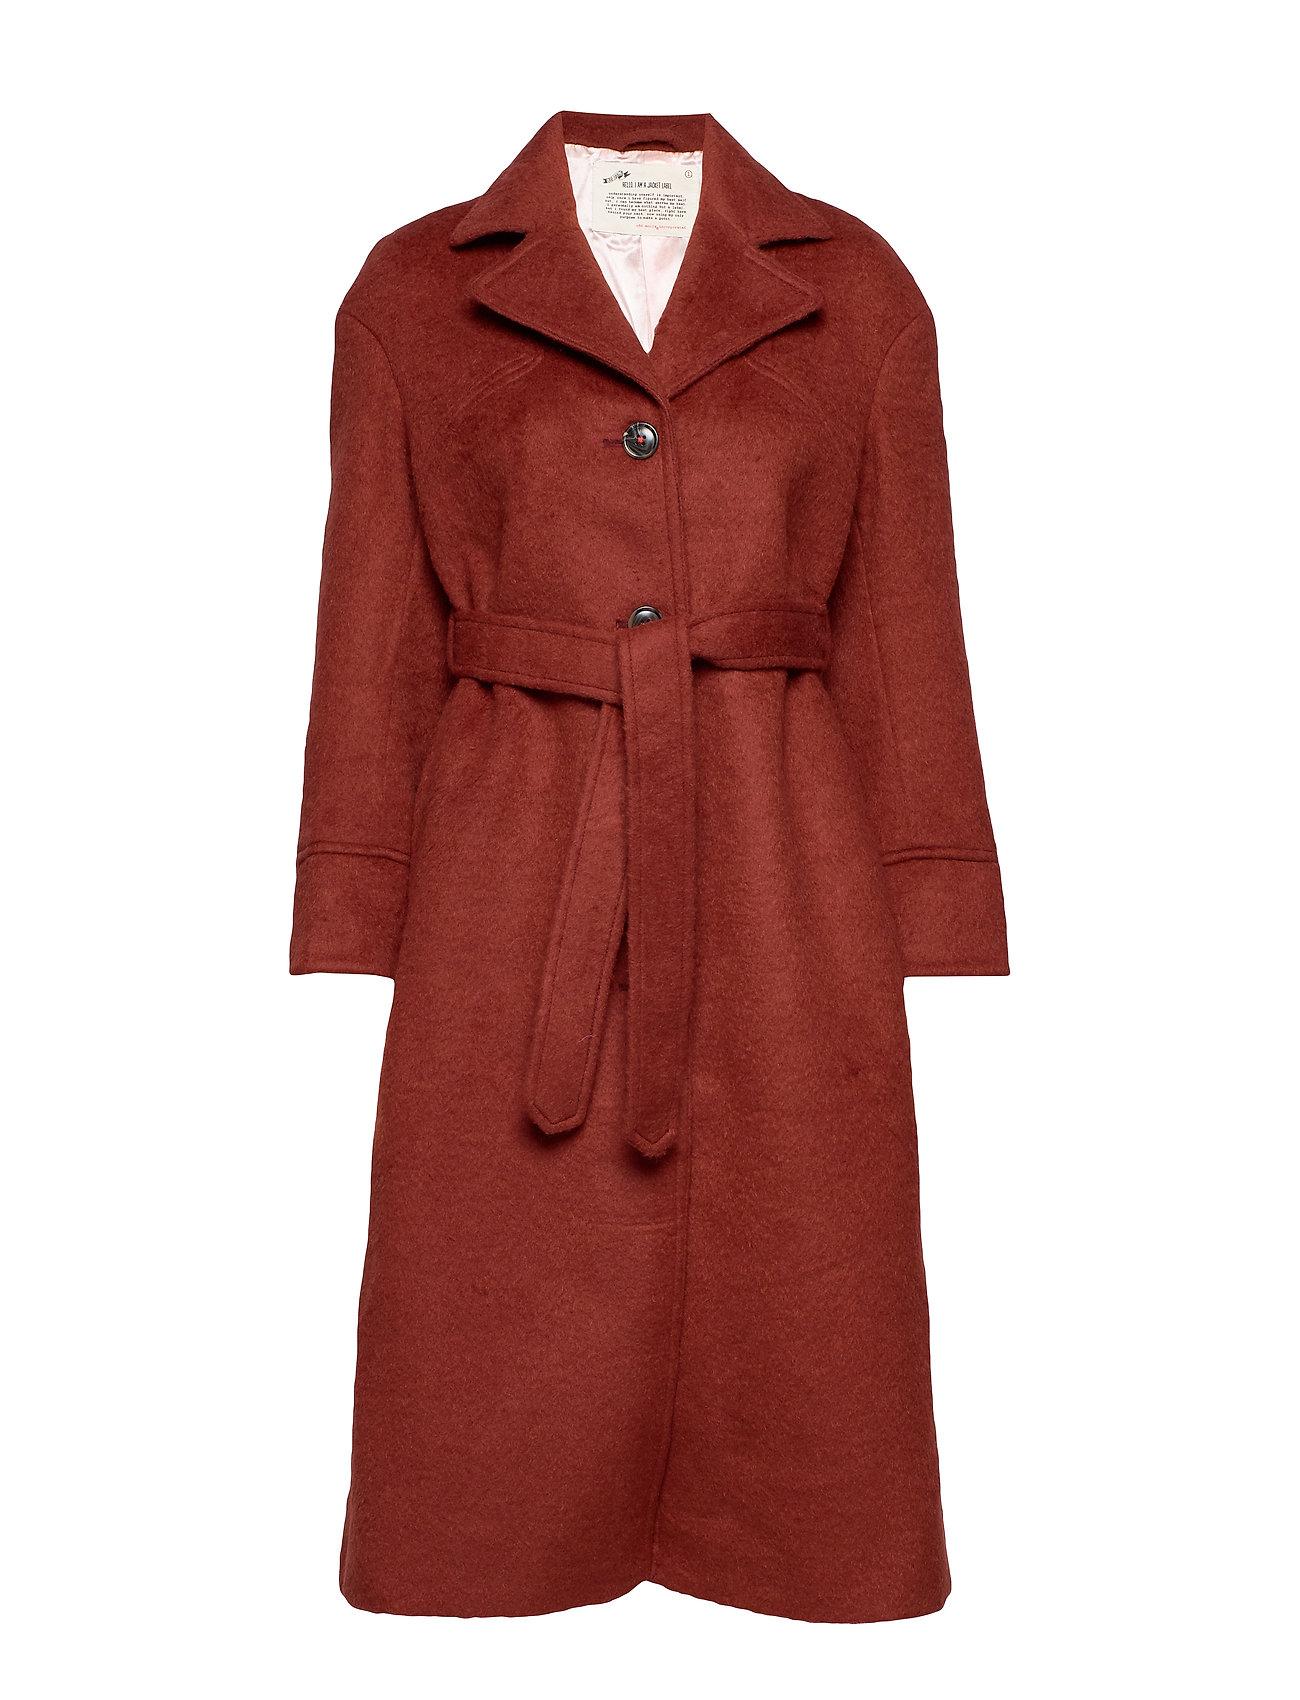 ODD MOLLY Lengthy Beaut Coat - RUSSET BROWN